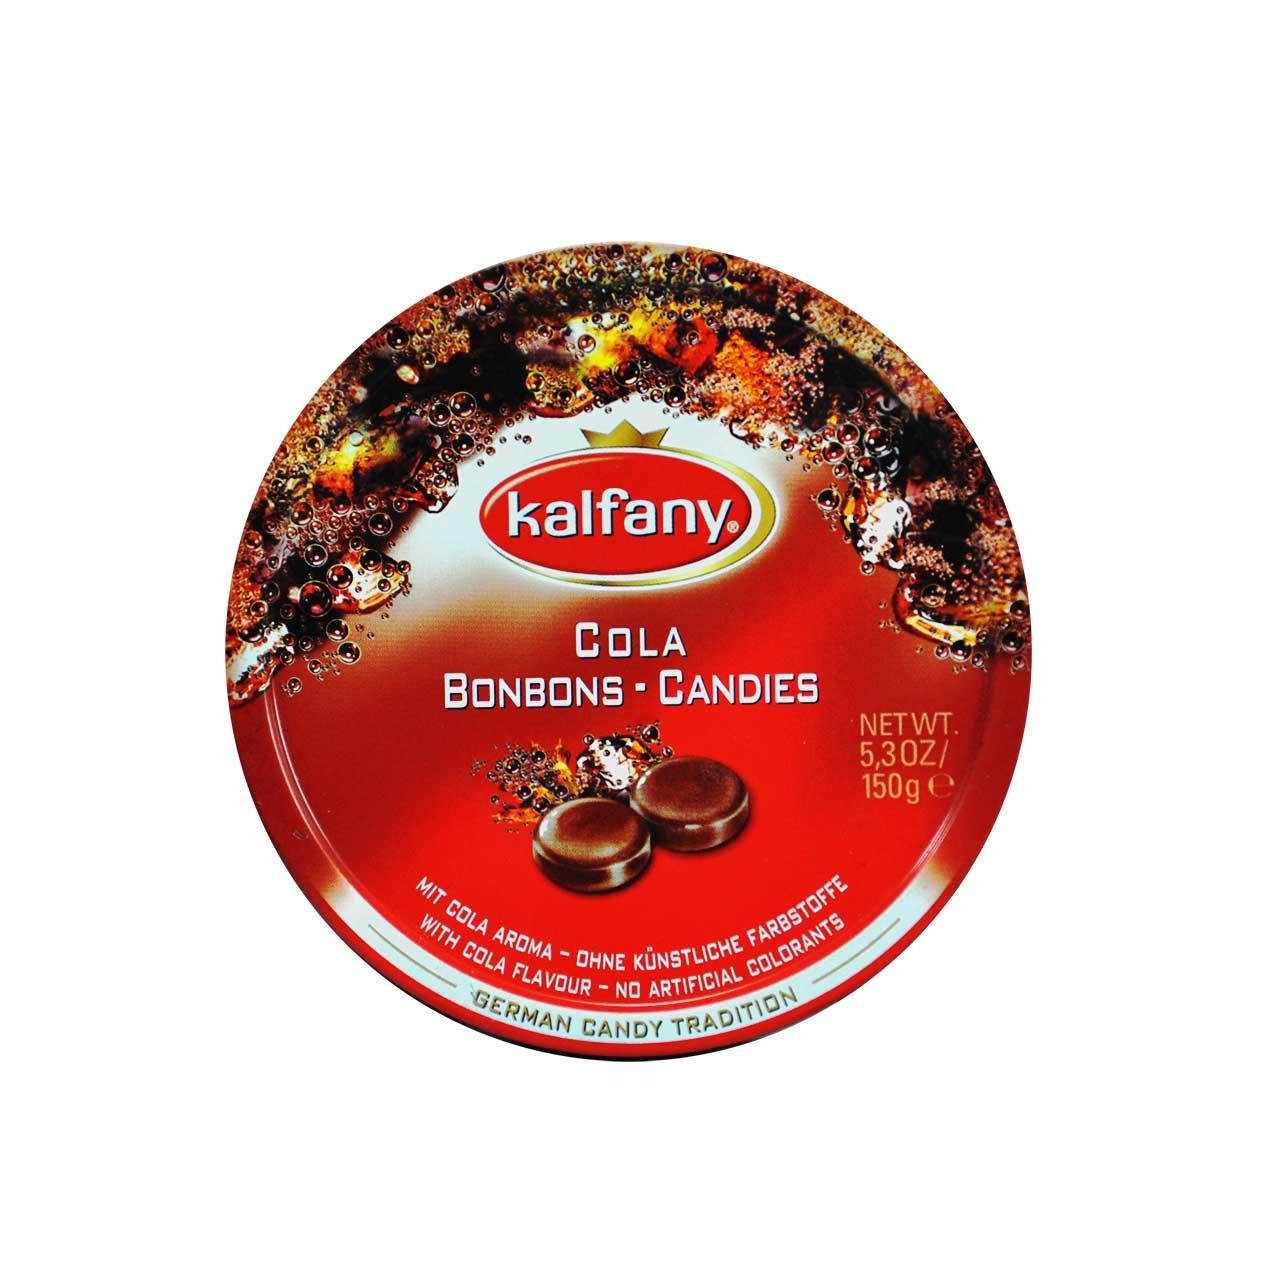 آبنبات کولا کالفانی – kalfany